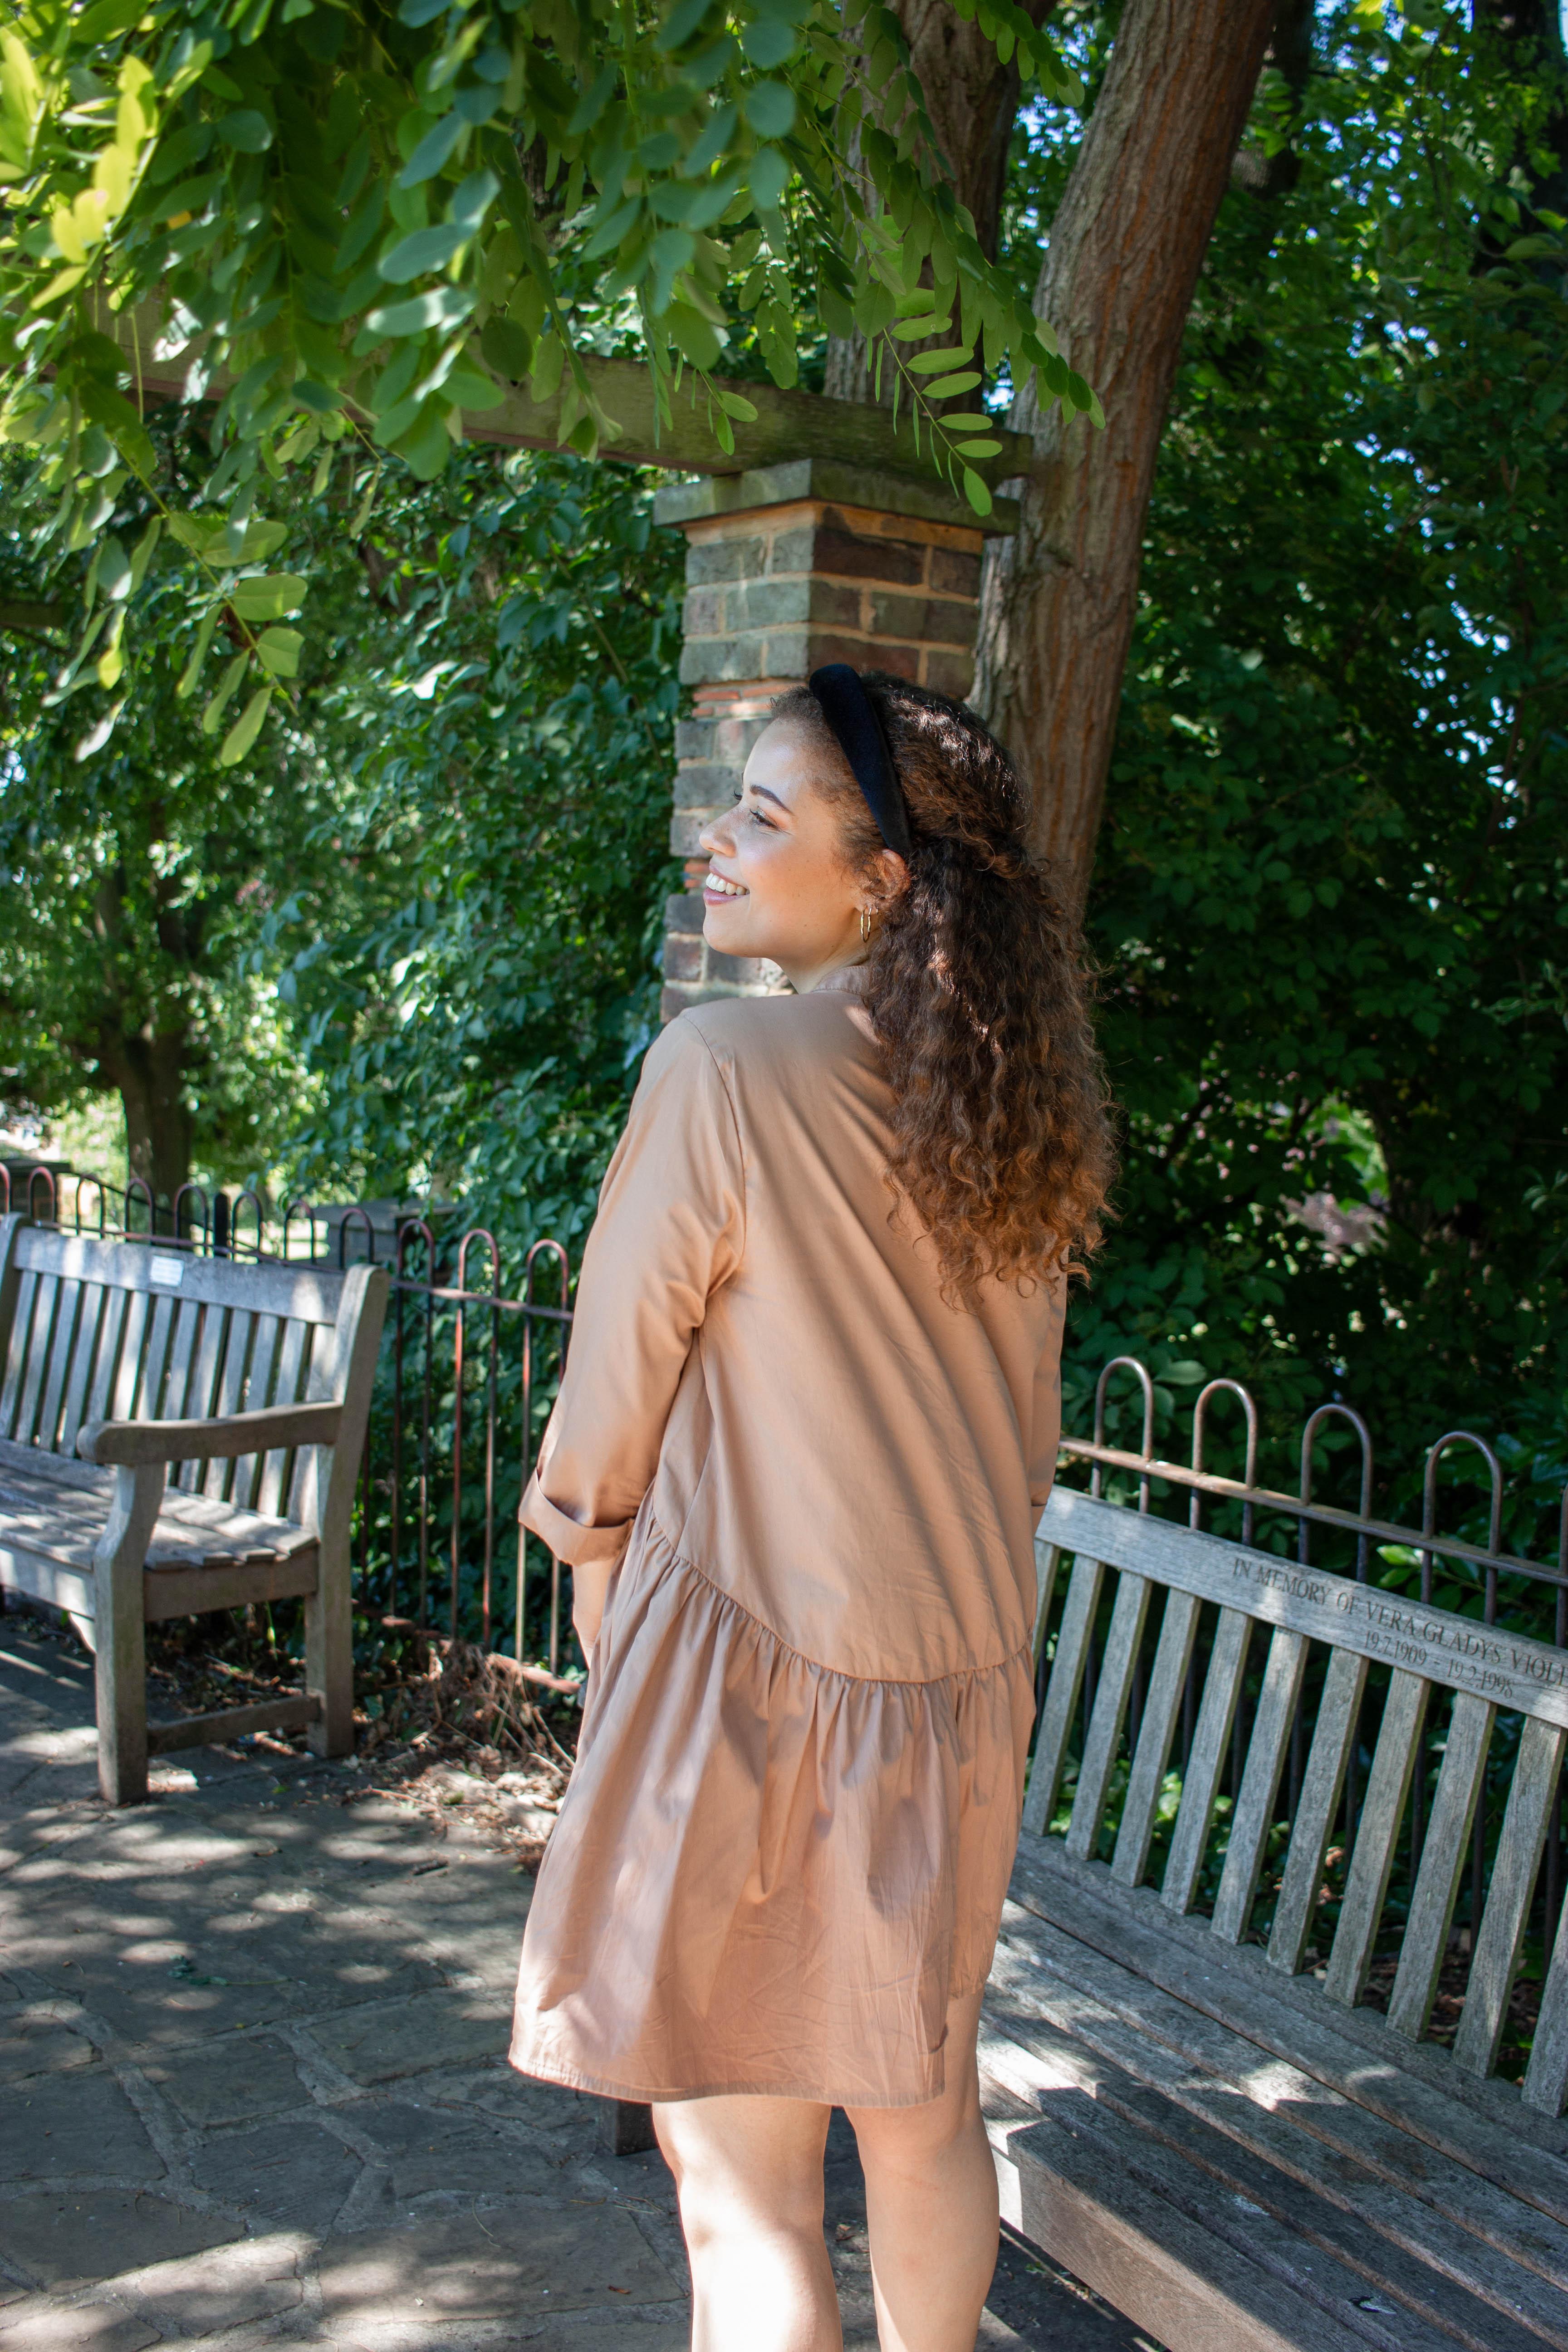 Eboni in Horniman Museum Gardens wearing a brown primark dress